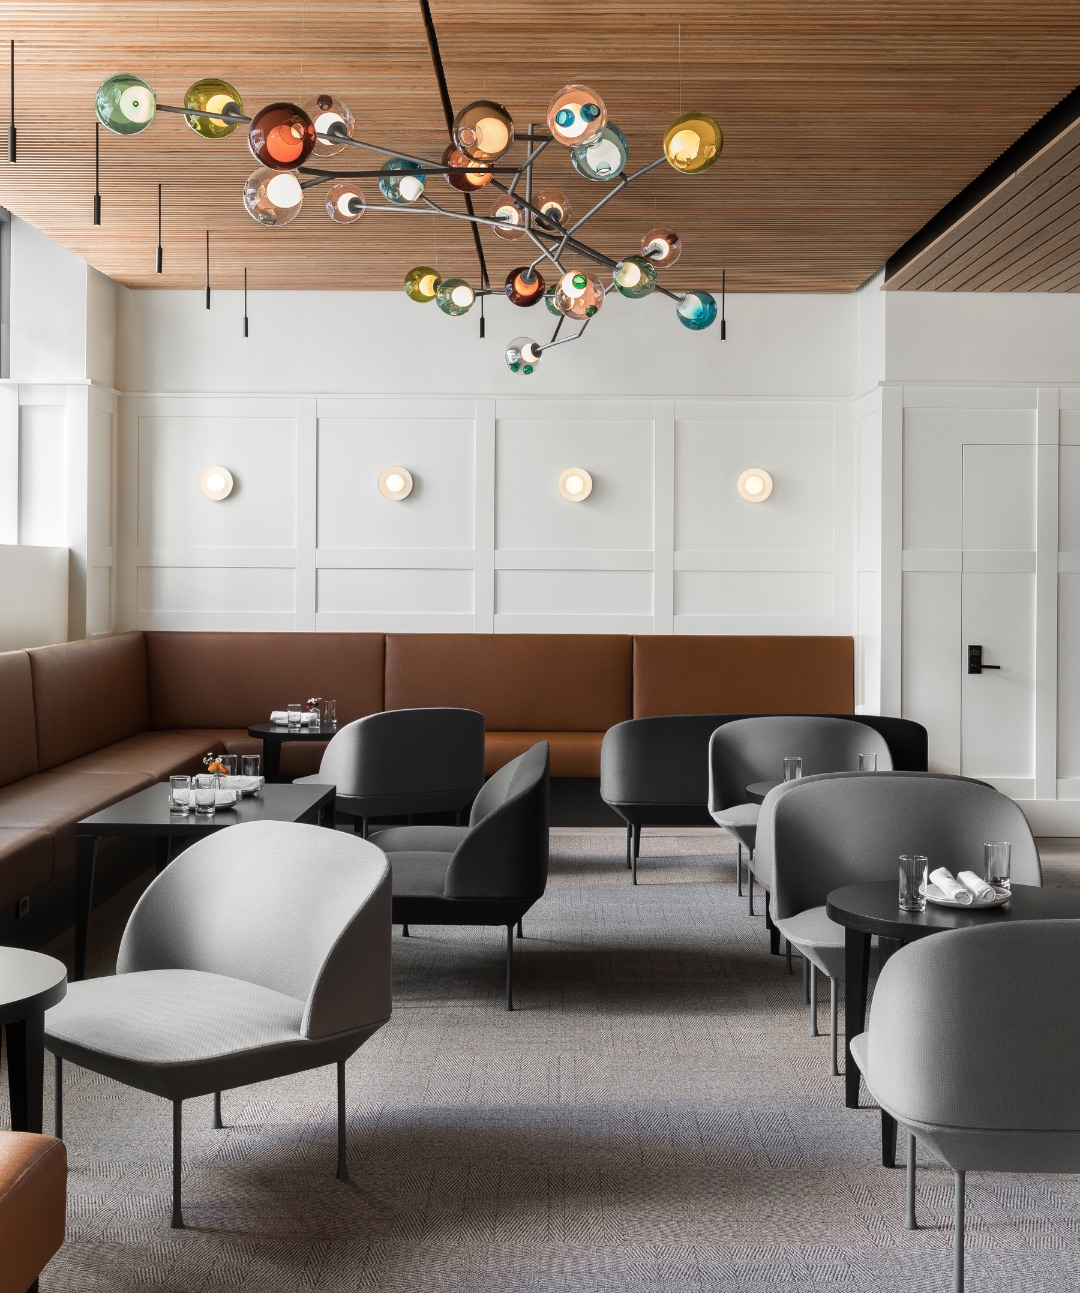 10_Heliotrope Architects_Cortina Restaurant_Inspirationist